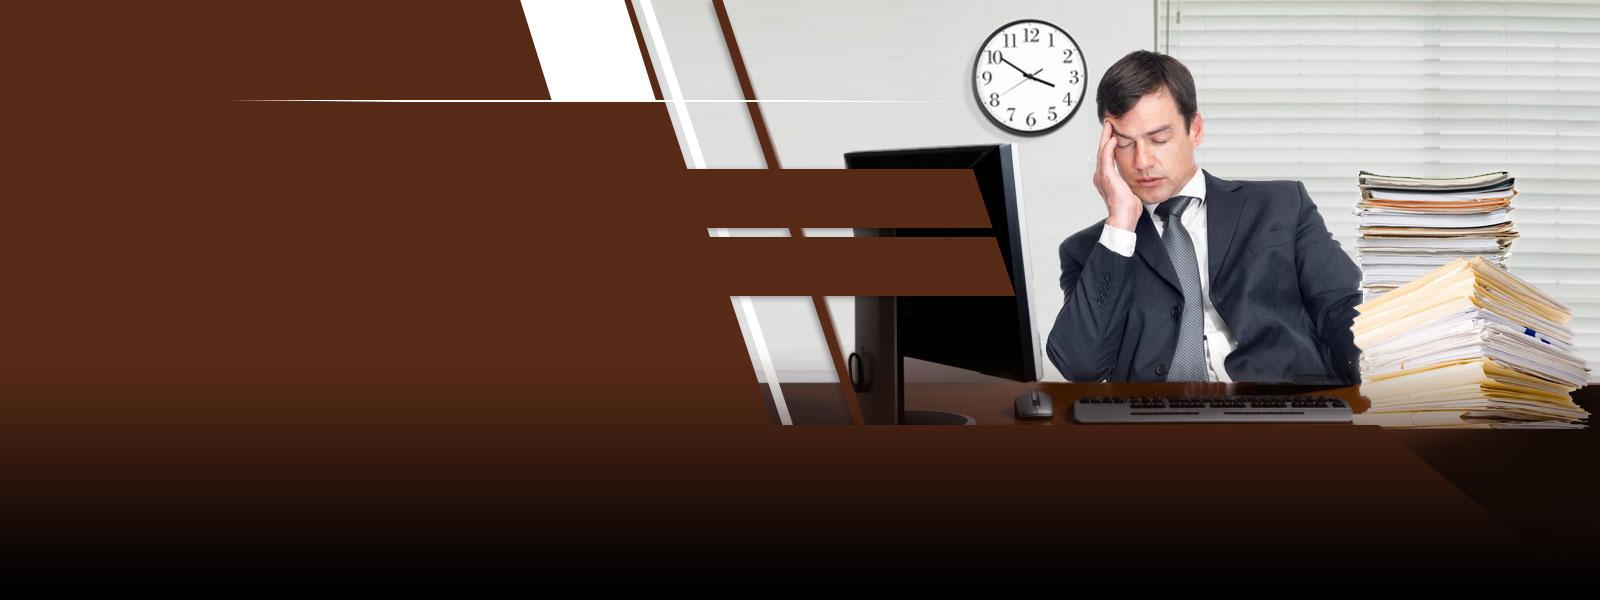 aka-avocats-entreprise-difficulte